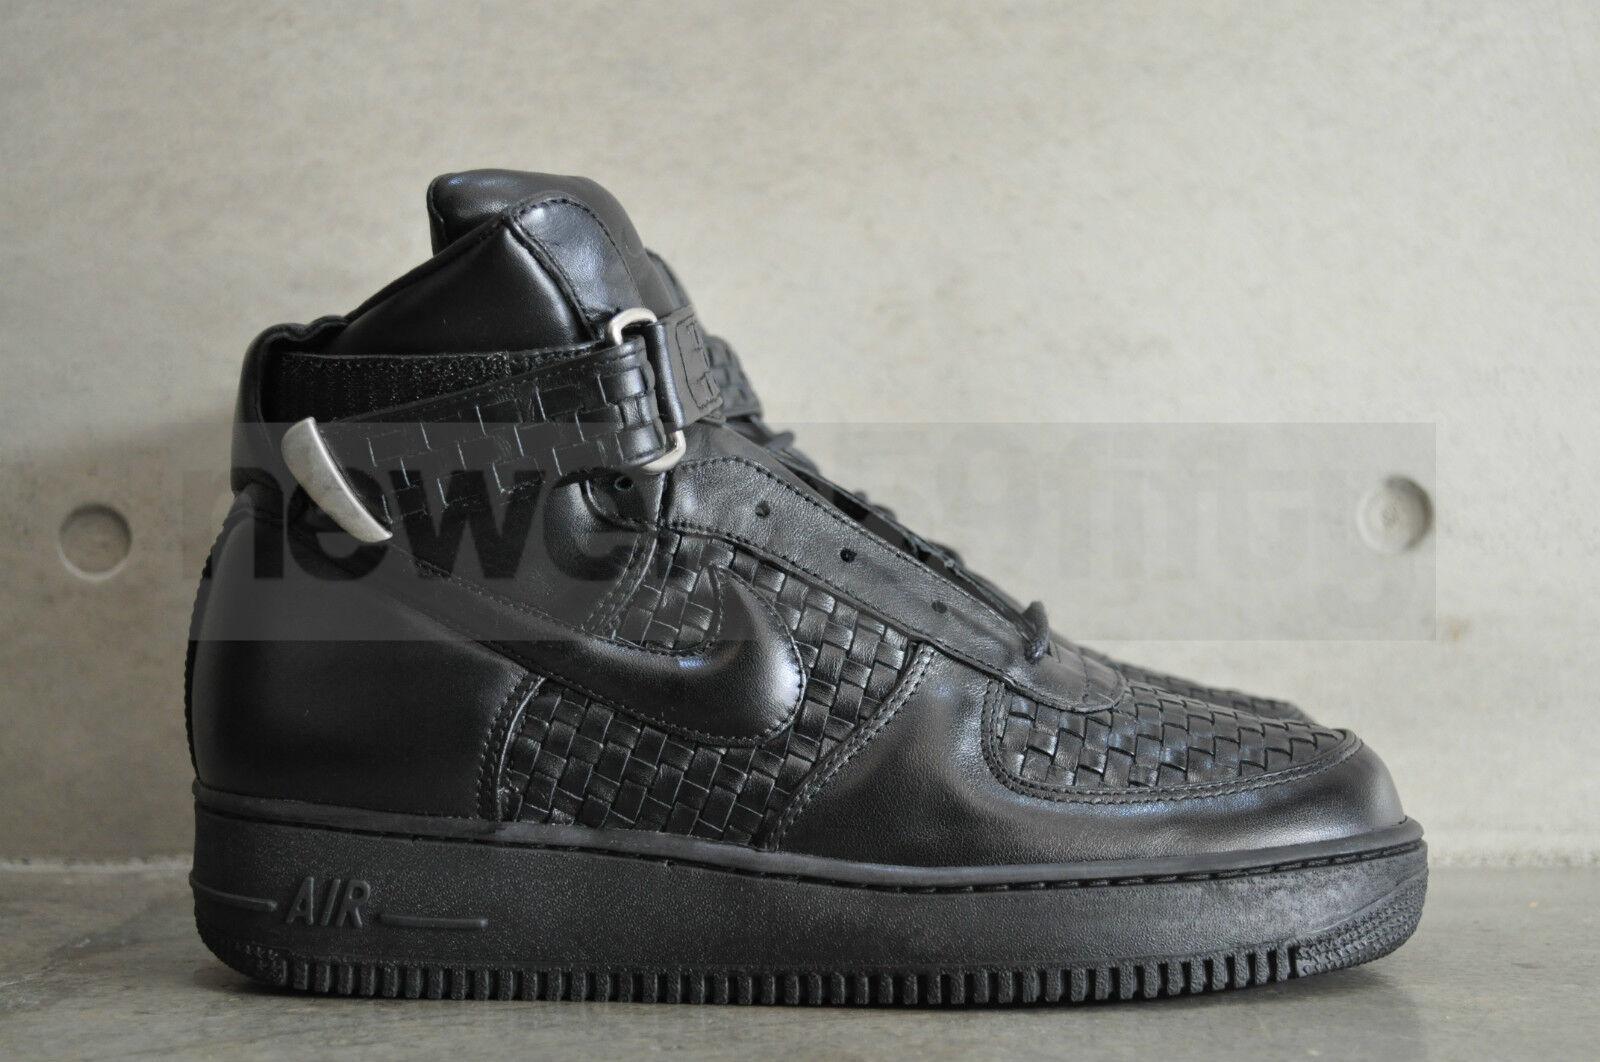 Nike Force 1 alta Lux ItaliaNegro/Negro hecho Air en ItaliaNegro/Negro Lux b0d253